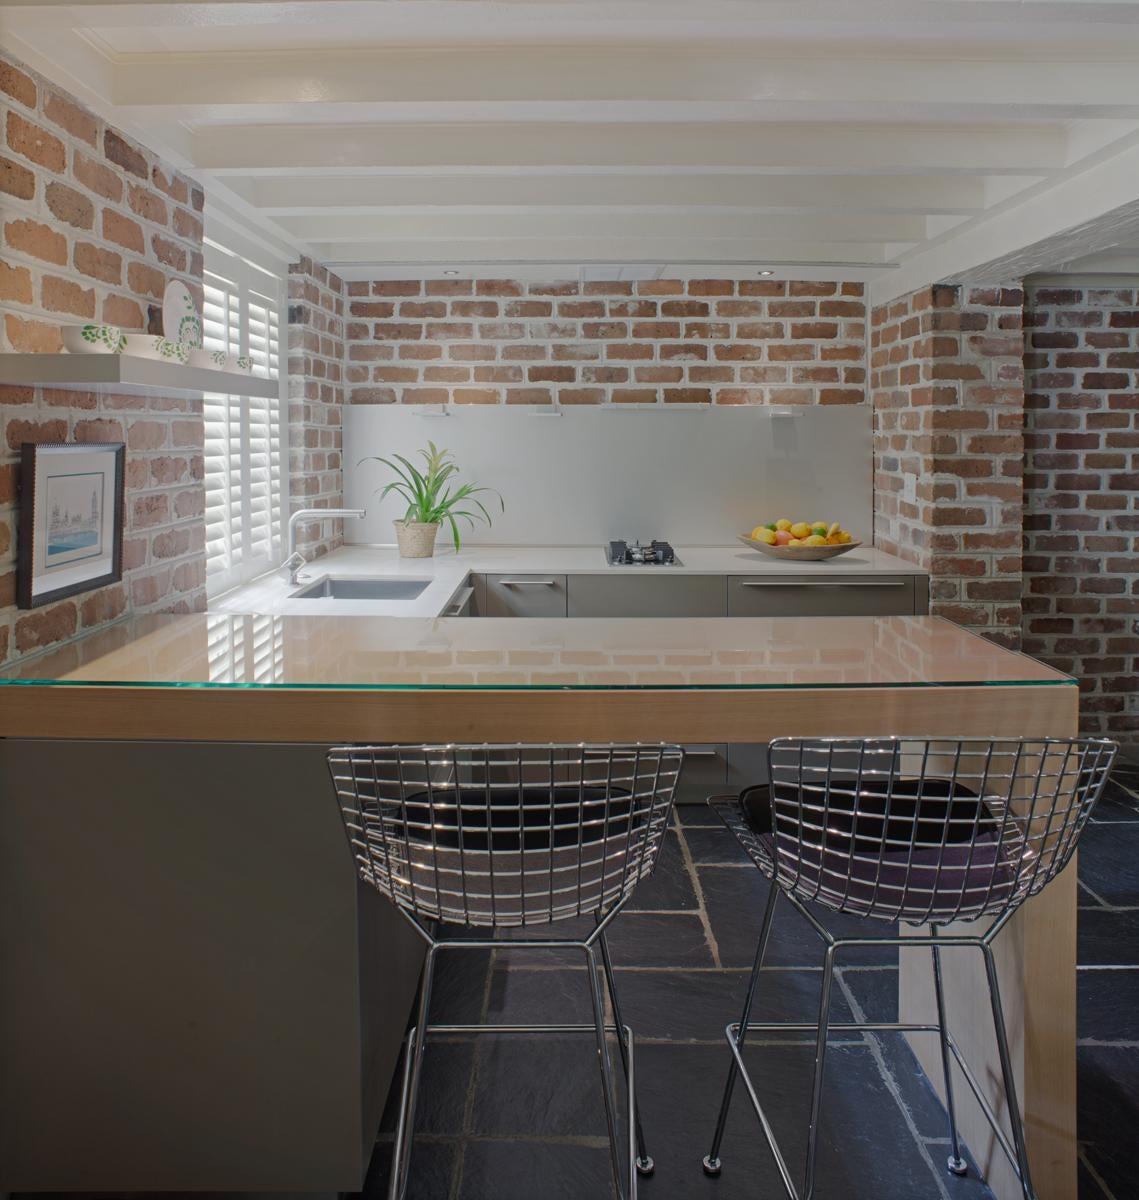 Bulthaup Basement Kitchen